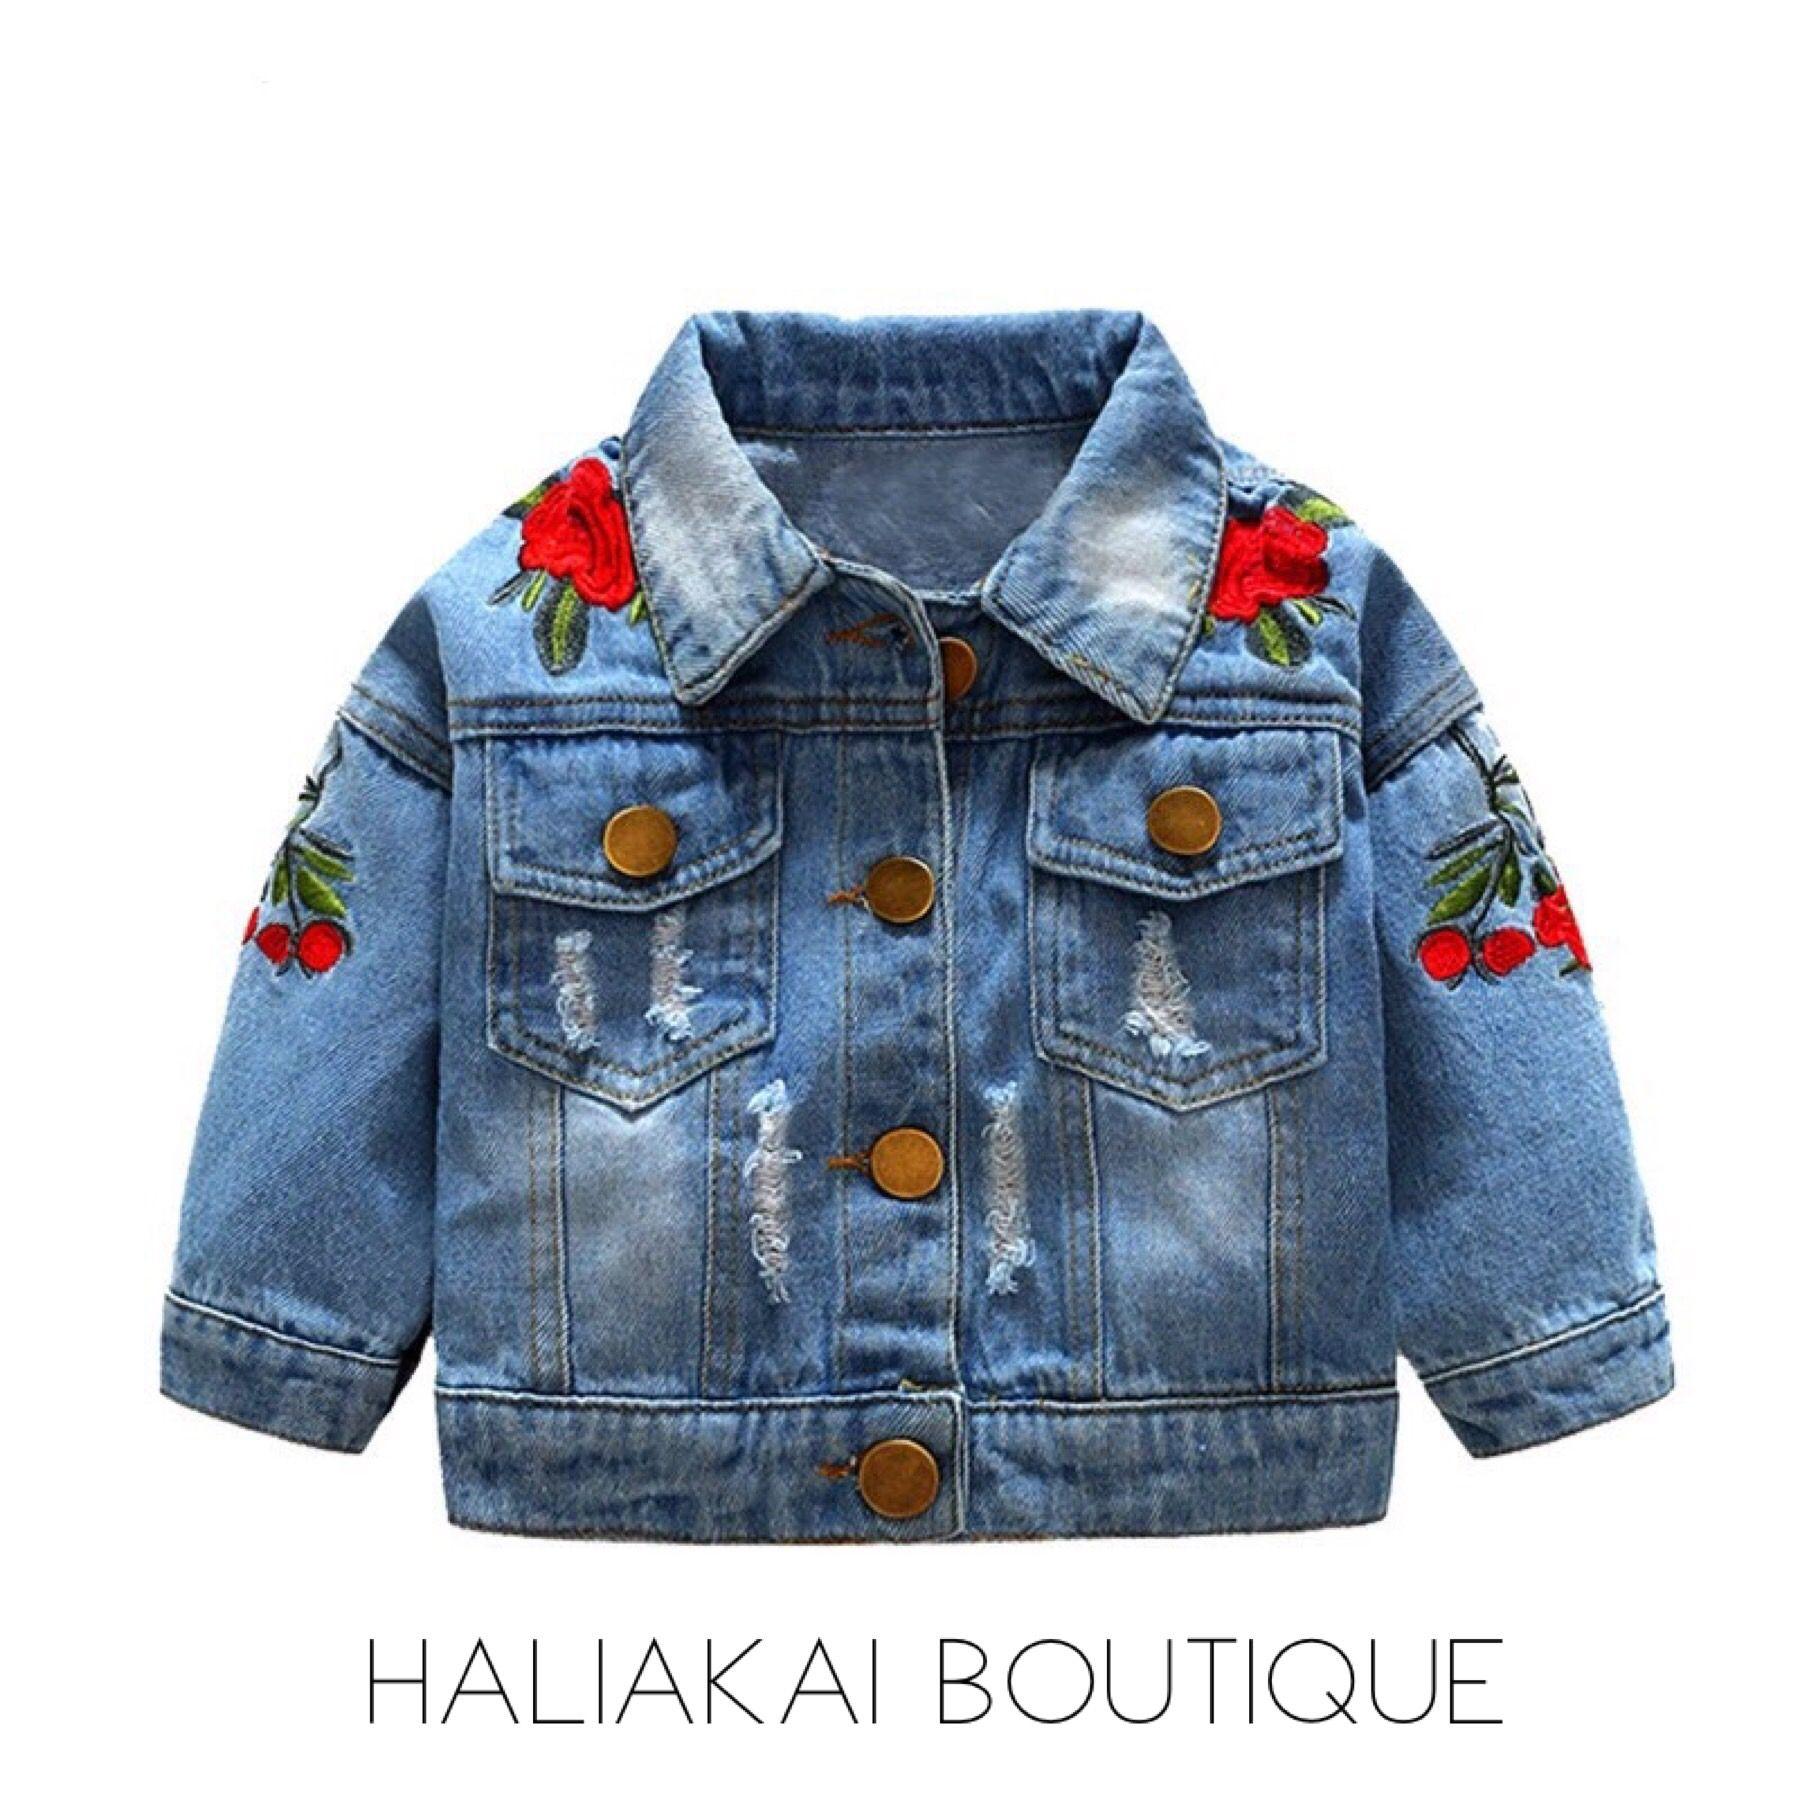 Rose Distressed Jean Jacket Girls Denim Jacket Vintage Denim Jacket Baby Denim Jacket [ 1800 x 1800 Pixel ]